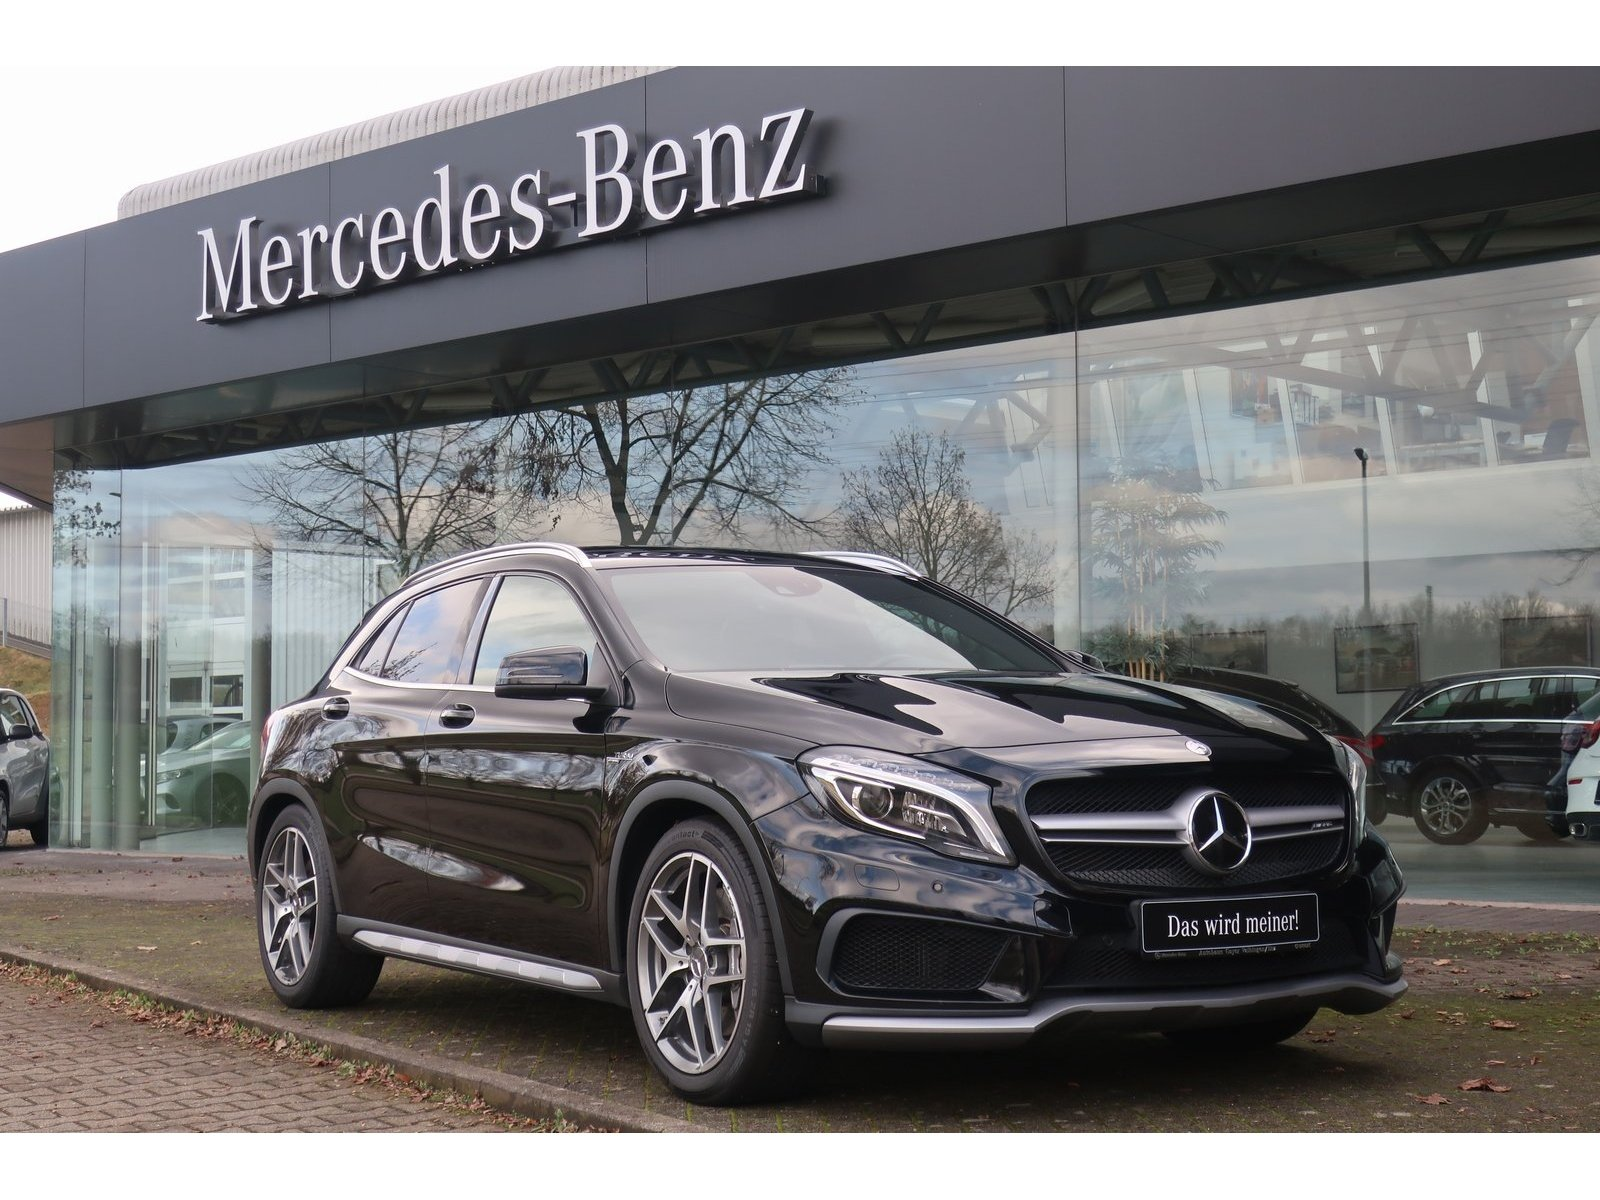 Mercedes-Benz GLA 45 AMG 4Matic|Distronic|Comand|ILS|Panodach, Jahr 2015, Benzin